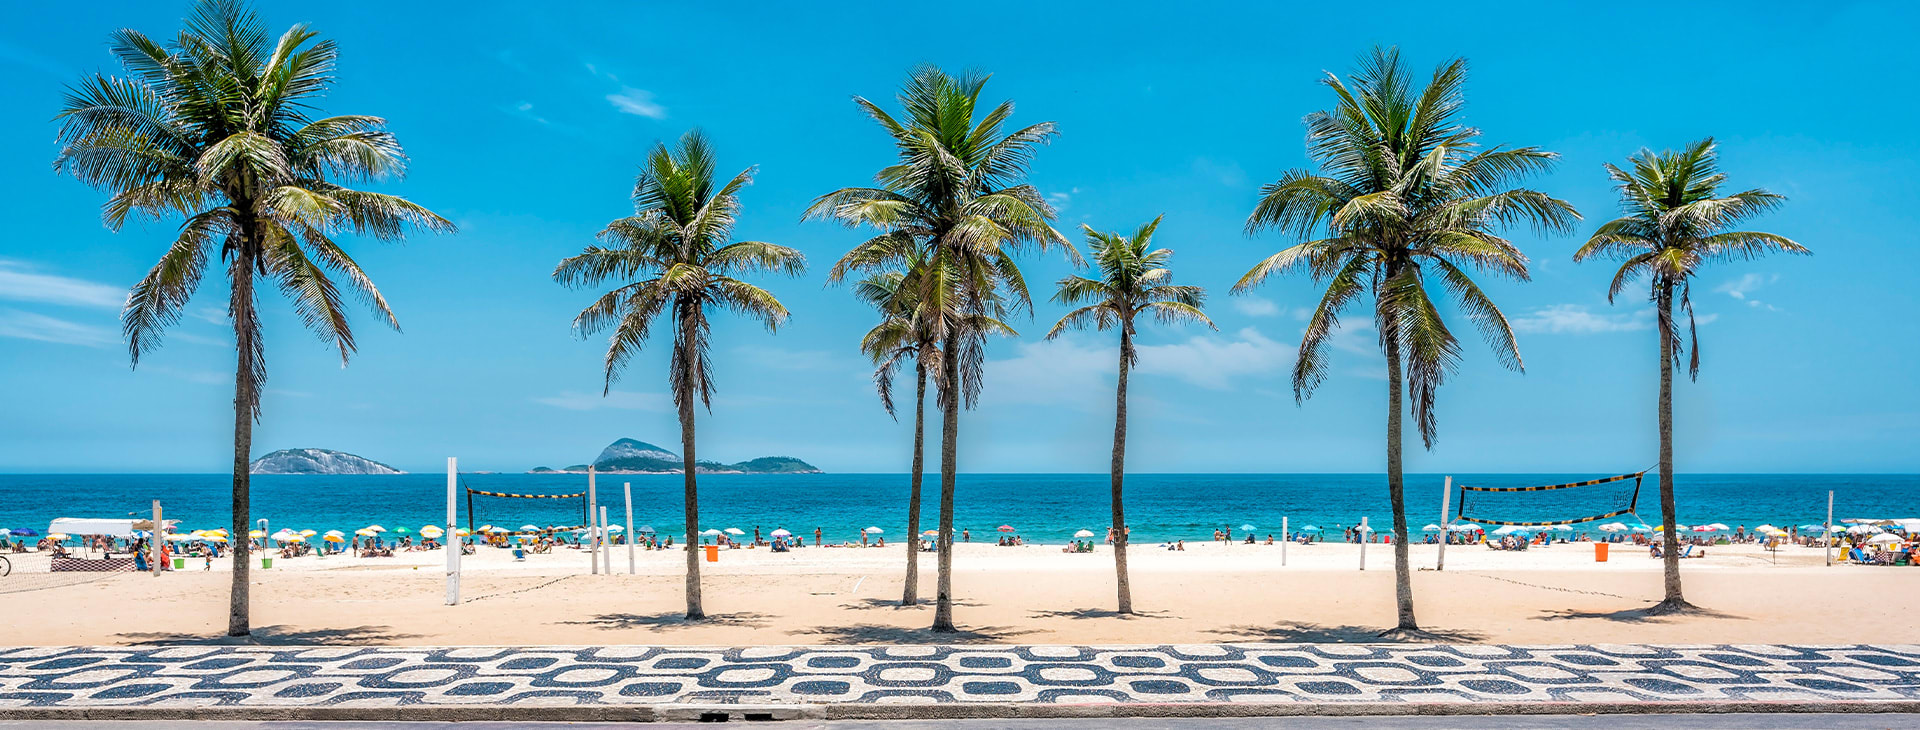 Palms Ipanema Beach